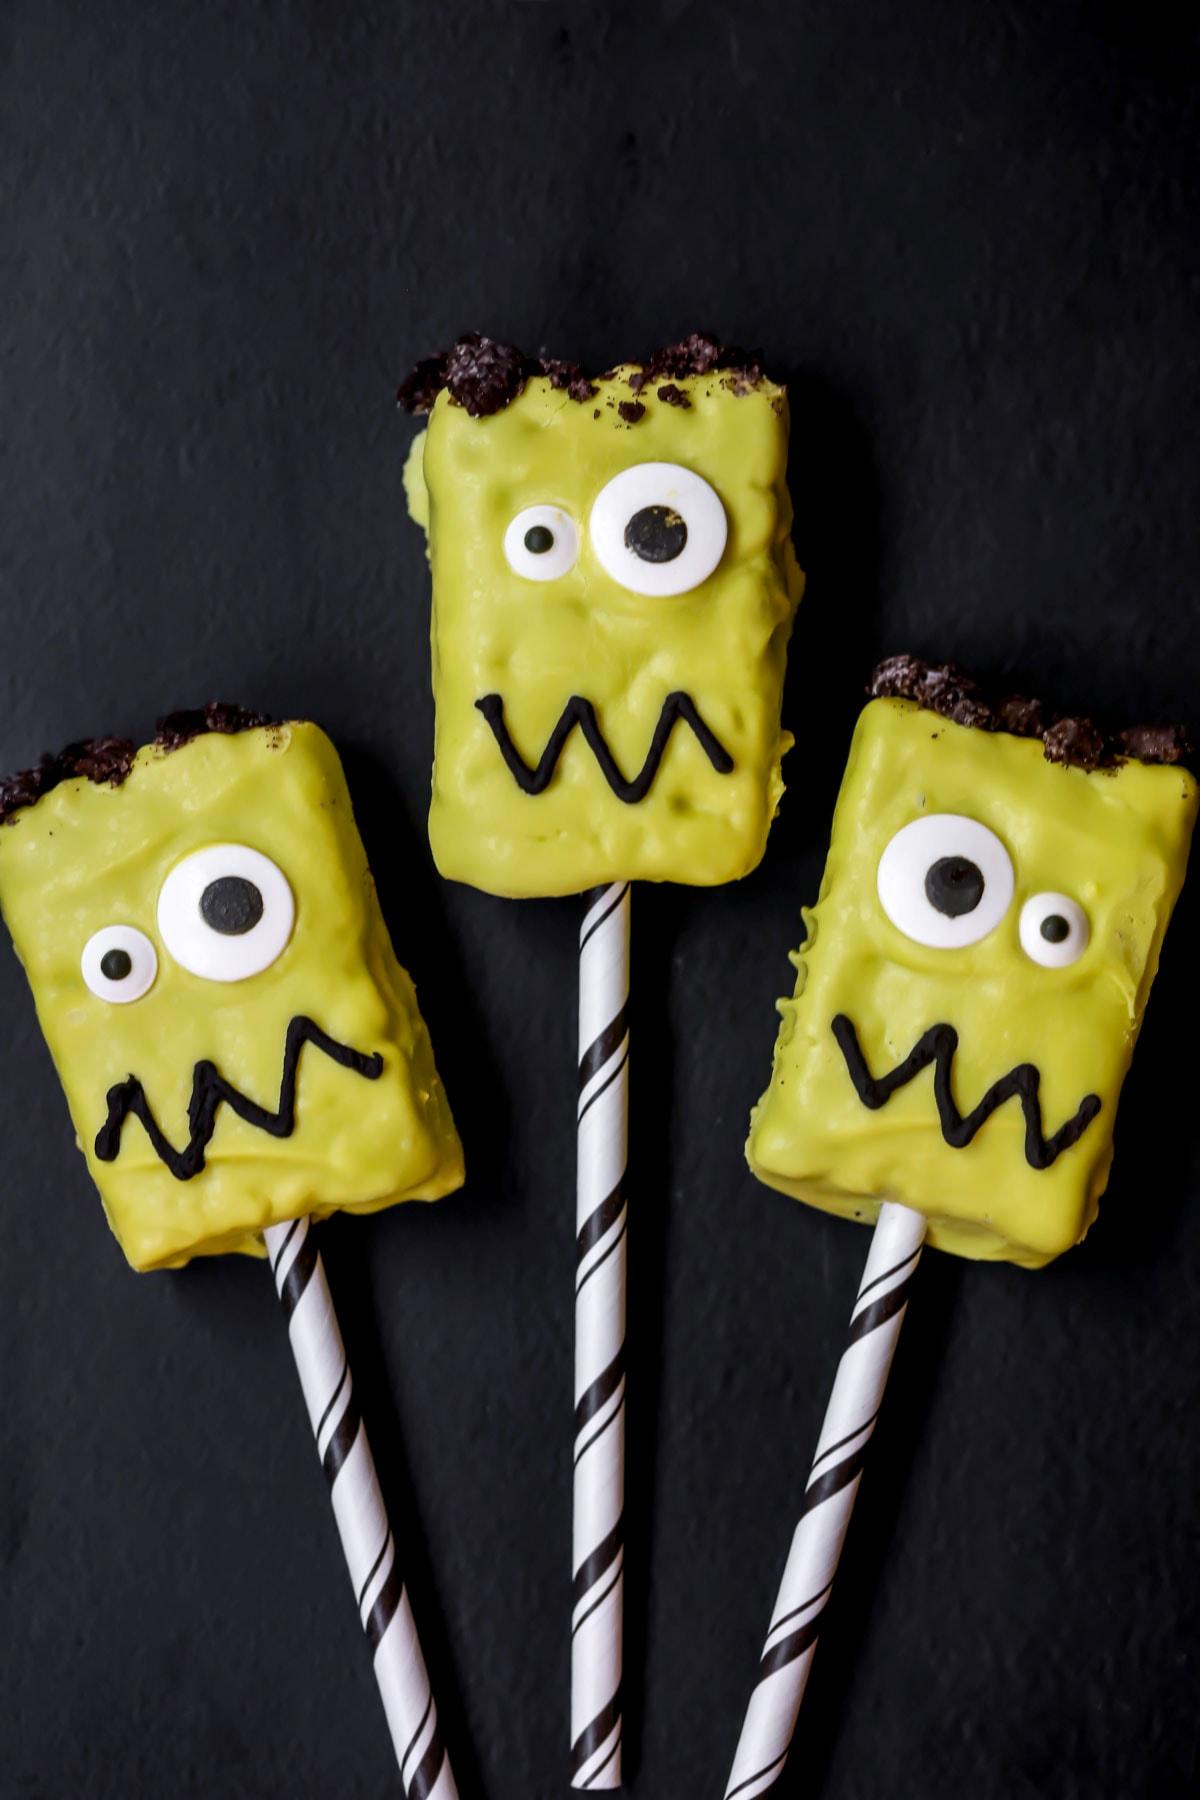 Frankenstein Rice Krispies Treats on black and white straws